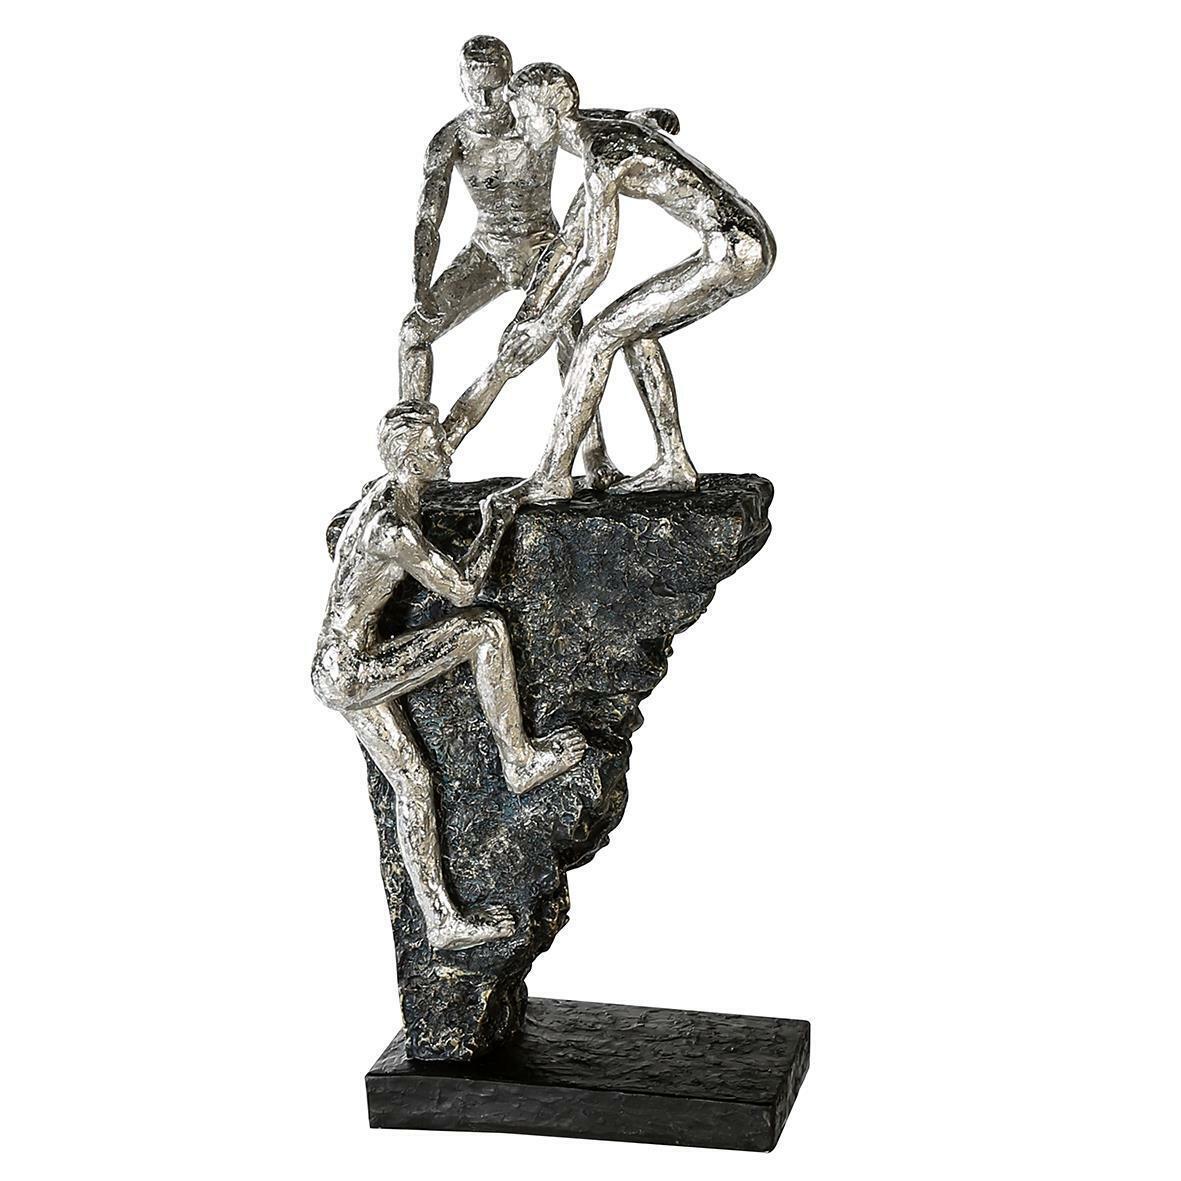 Casablancoa escultura Friends Poly, Ant. plata 3 hombres en rocas, negra base BX